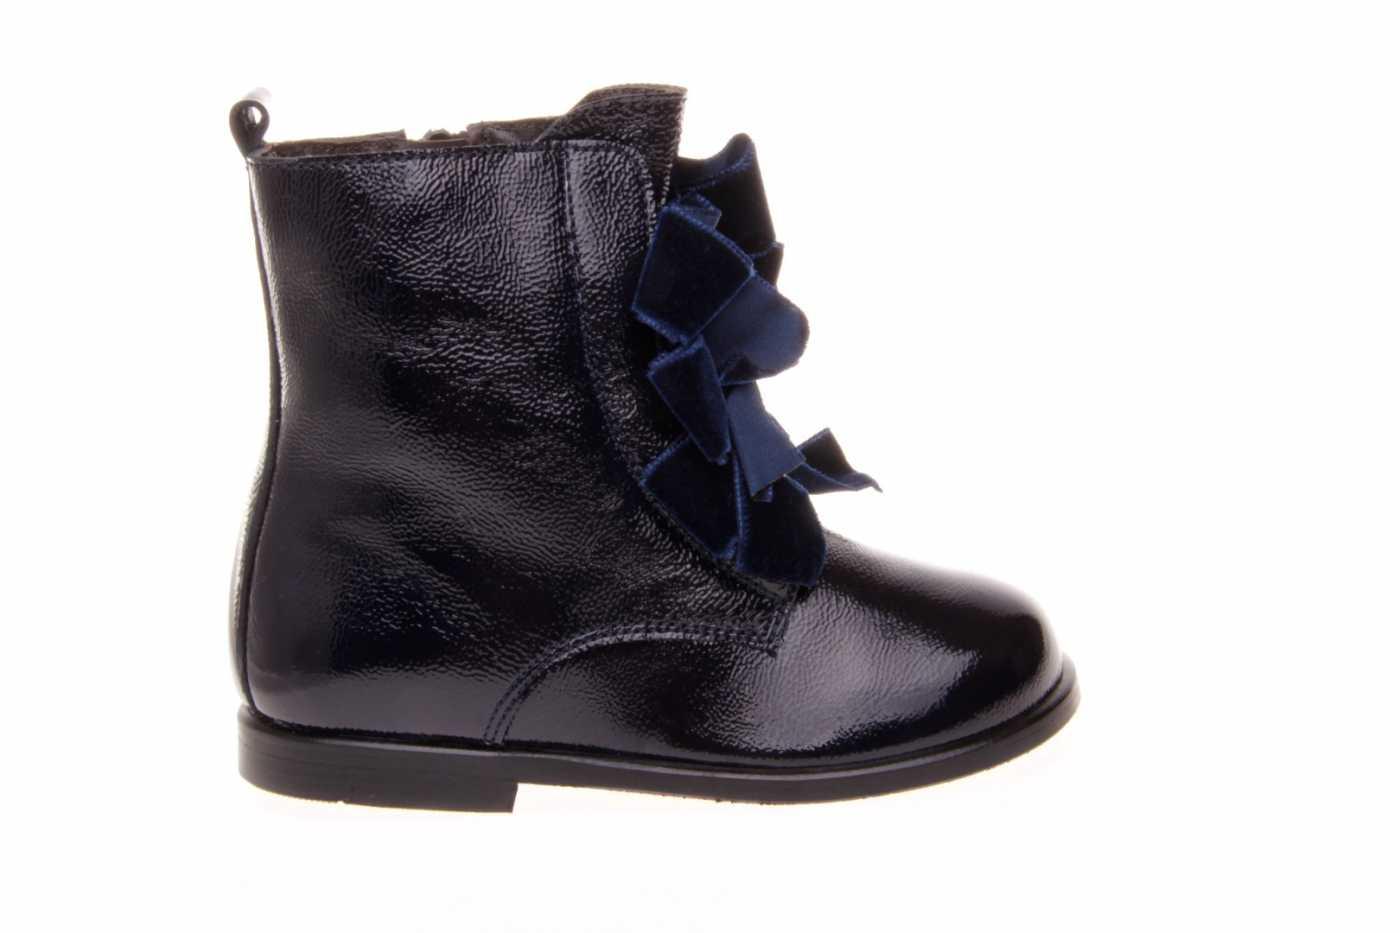 acaef37bd Comprar zapato tipo JOVEN NIÑA estilo BOTAS COLOR AZUL CHAROL